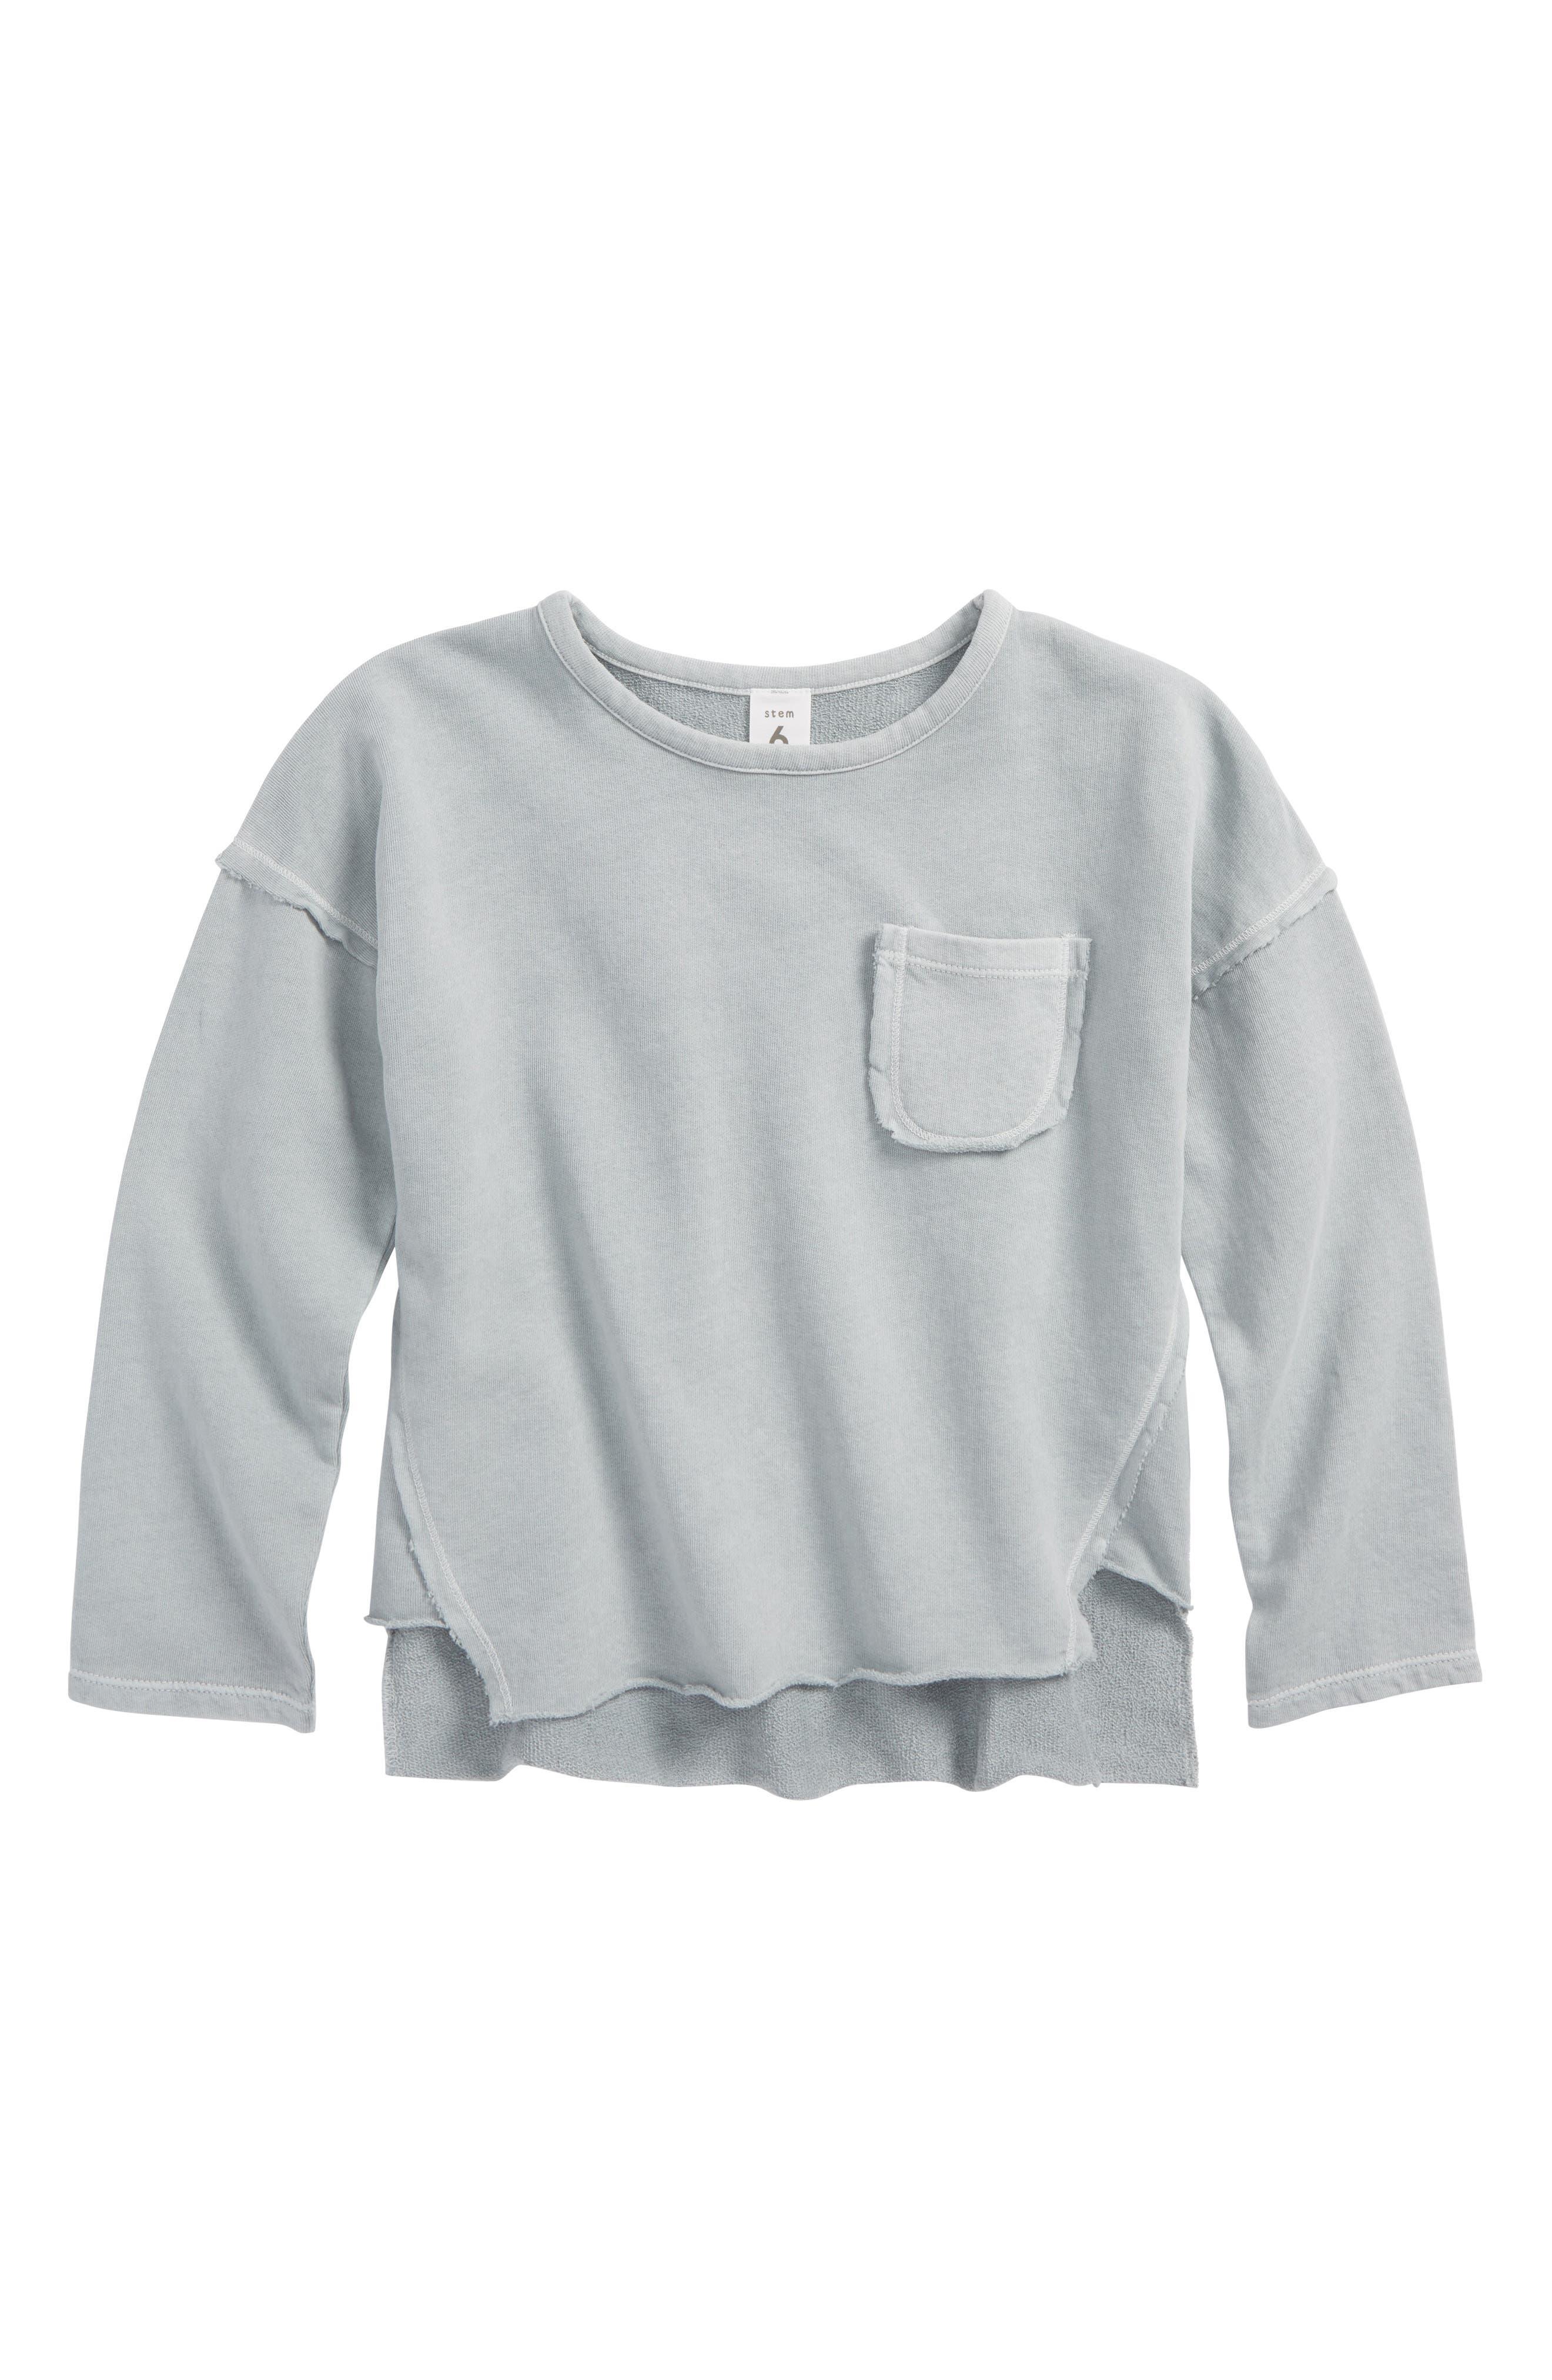 Pocket Sweatshirt,                             Main thumbnail 1, color,                             450